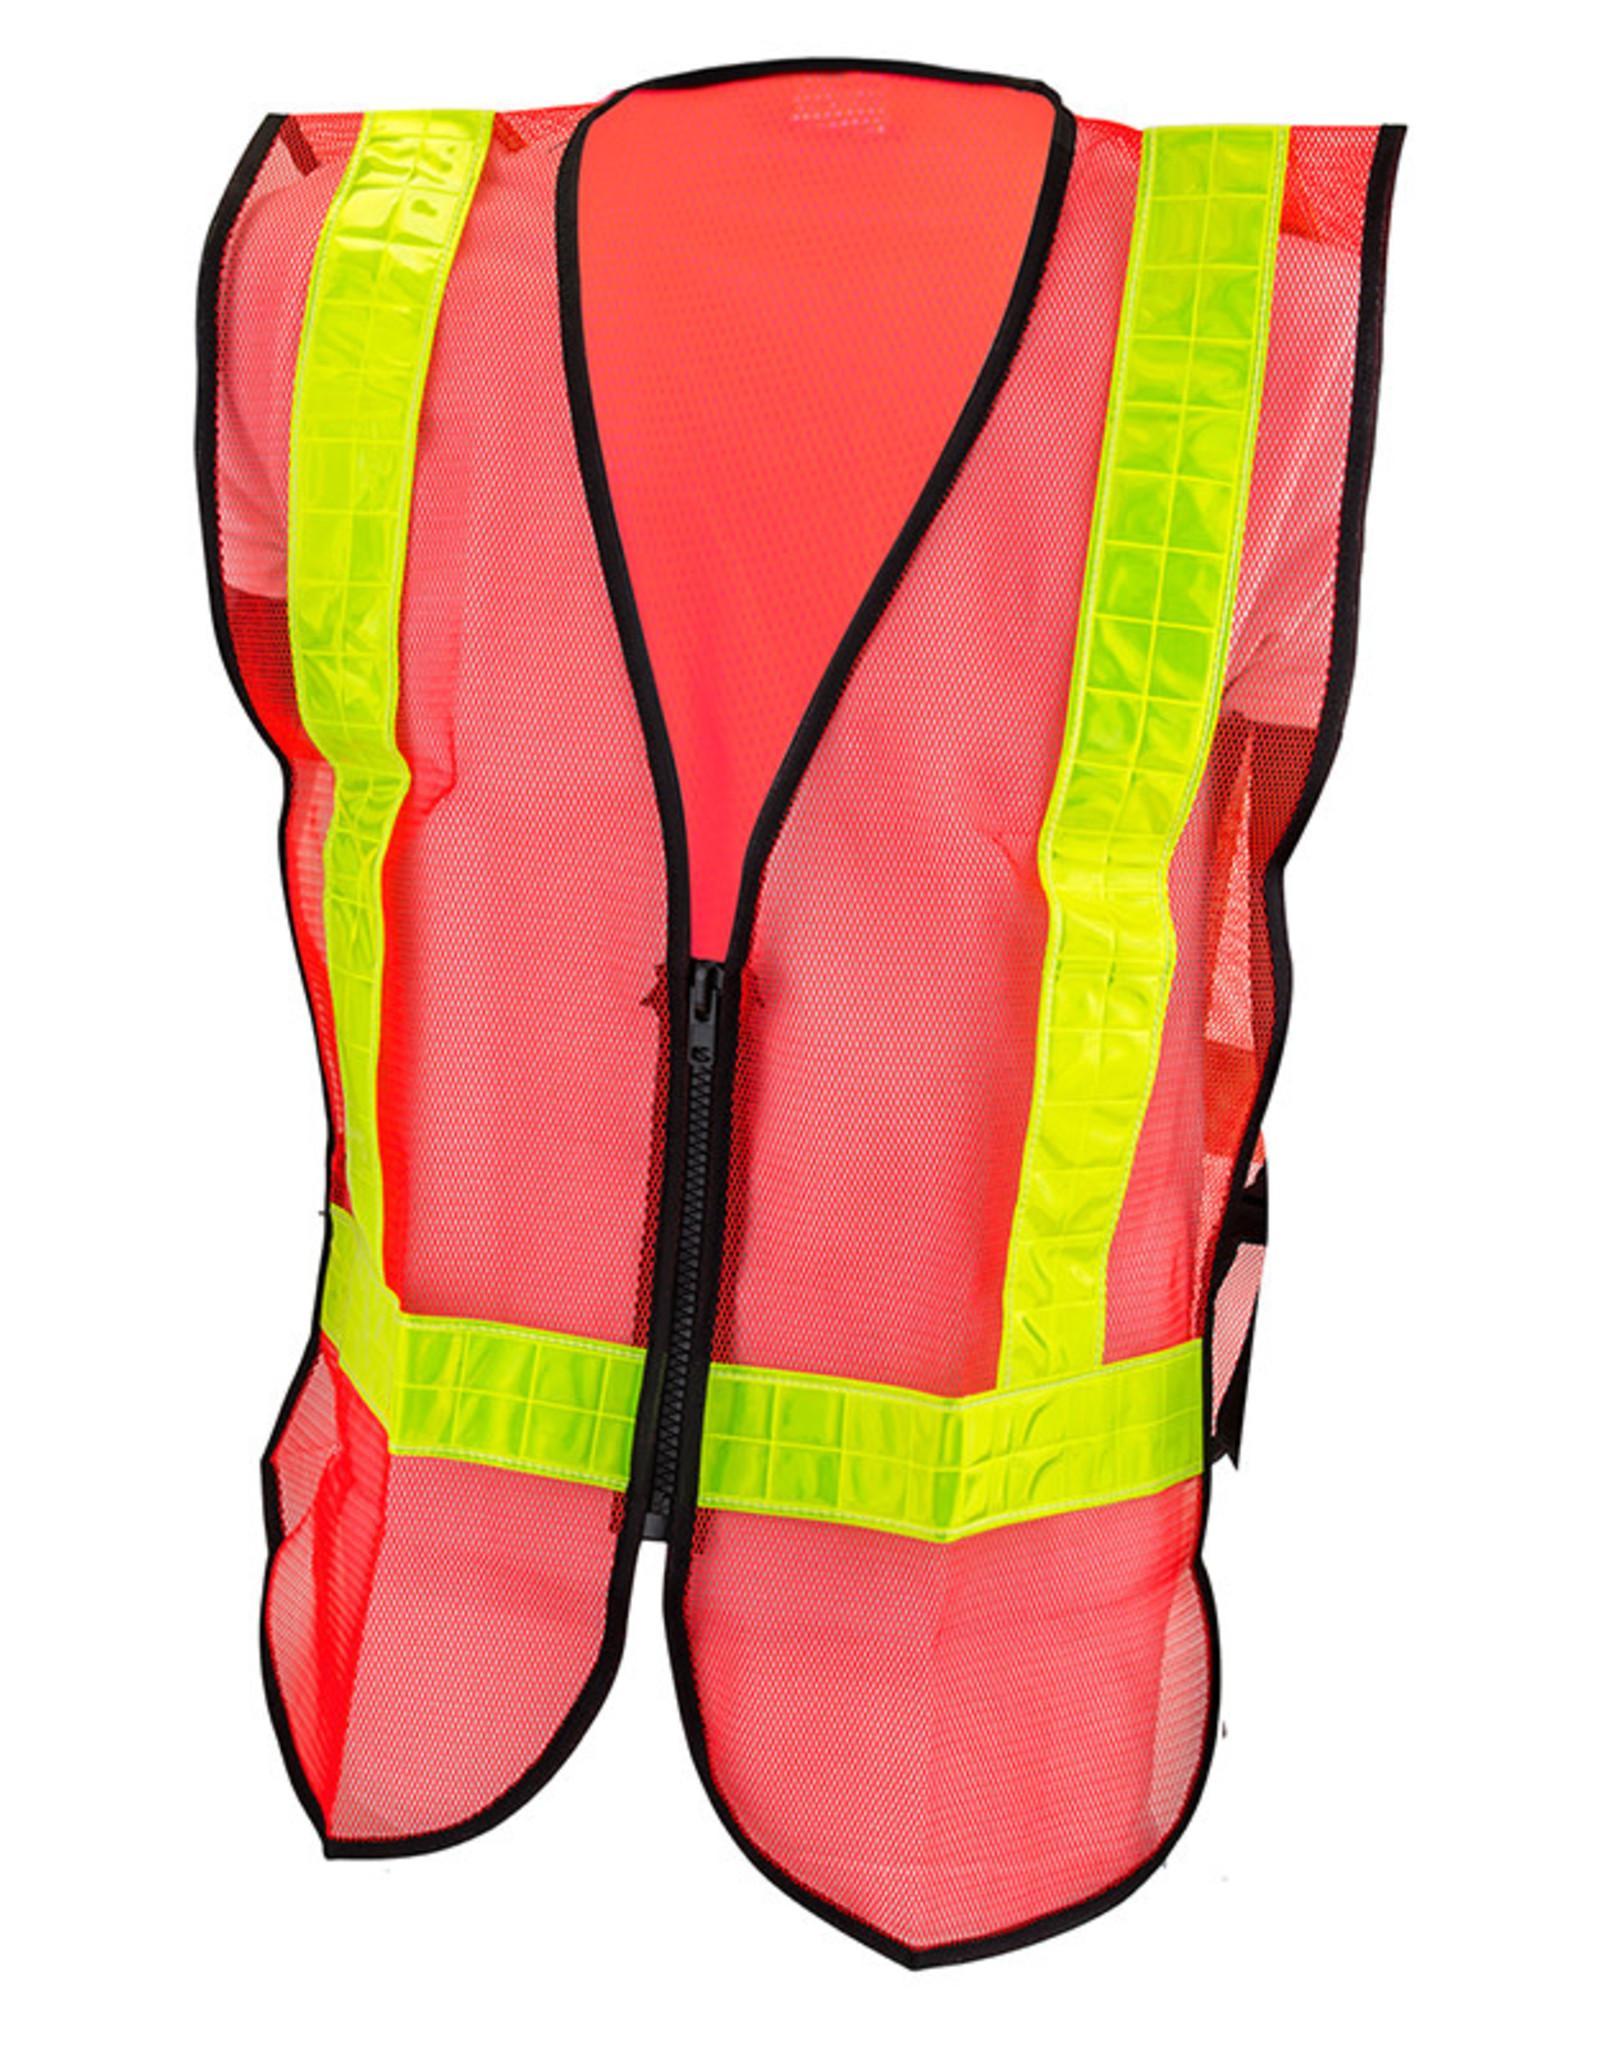 Sunlite Reflective Safety Vest